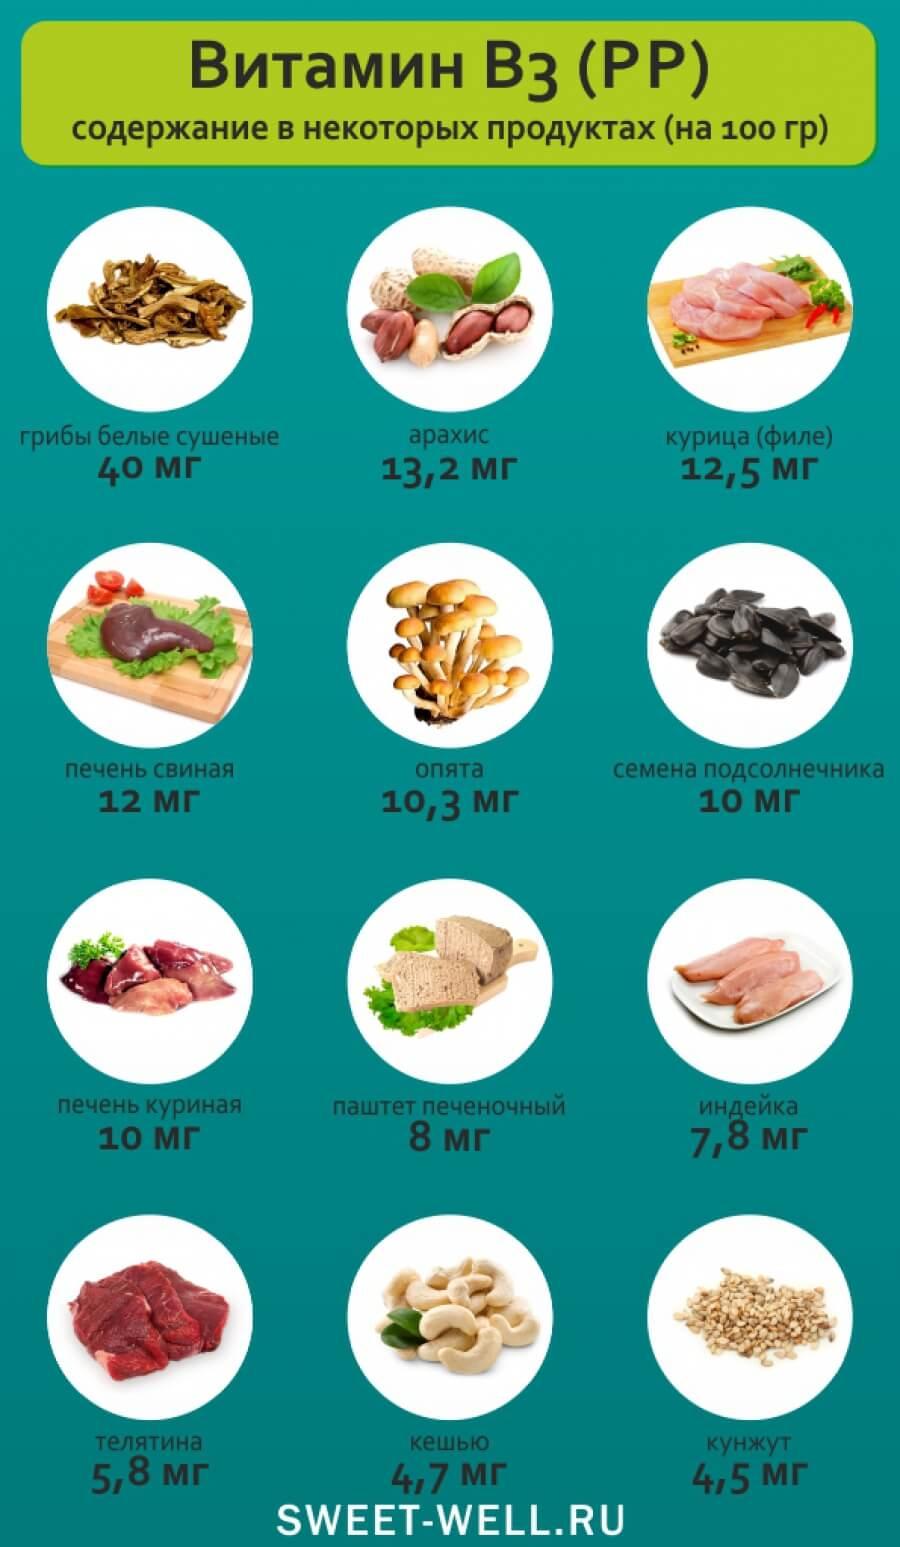 produkti-soderzhashie-vitamin-pp